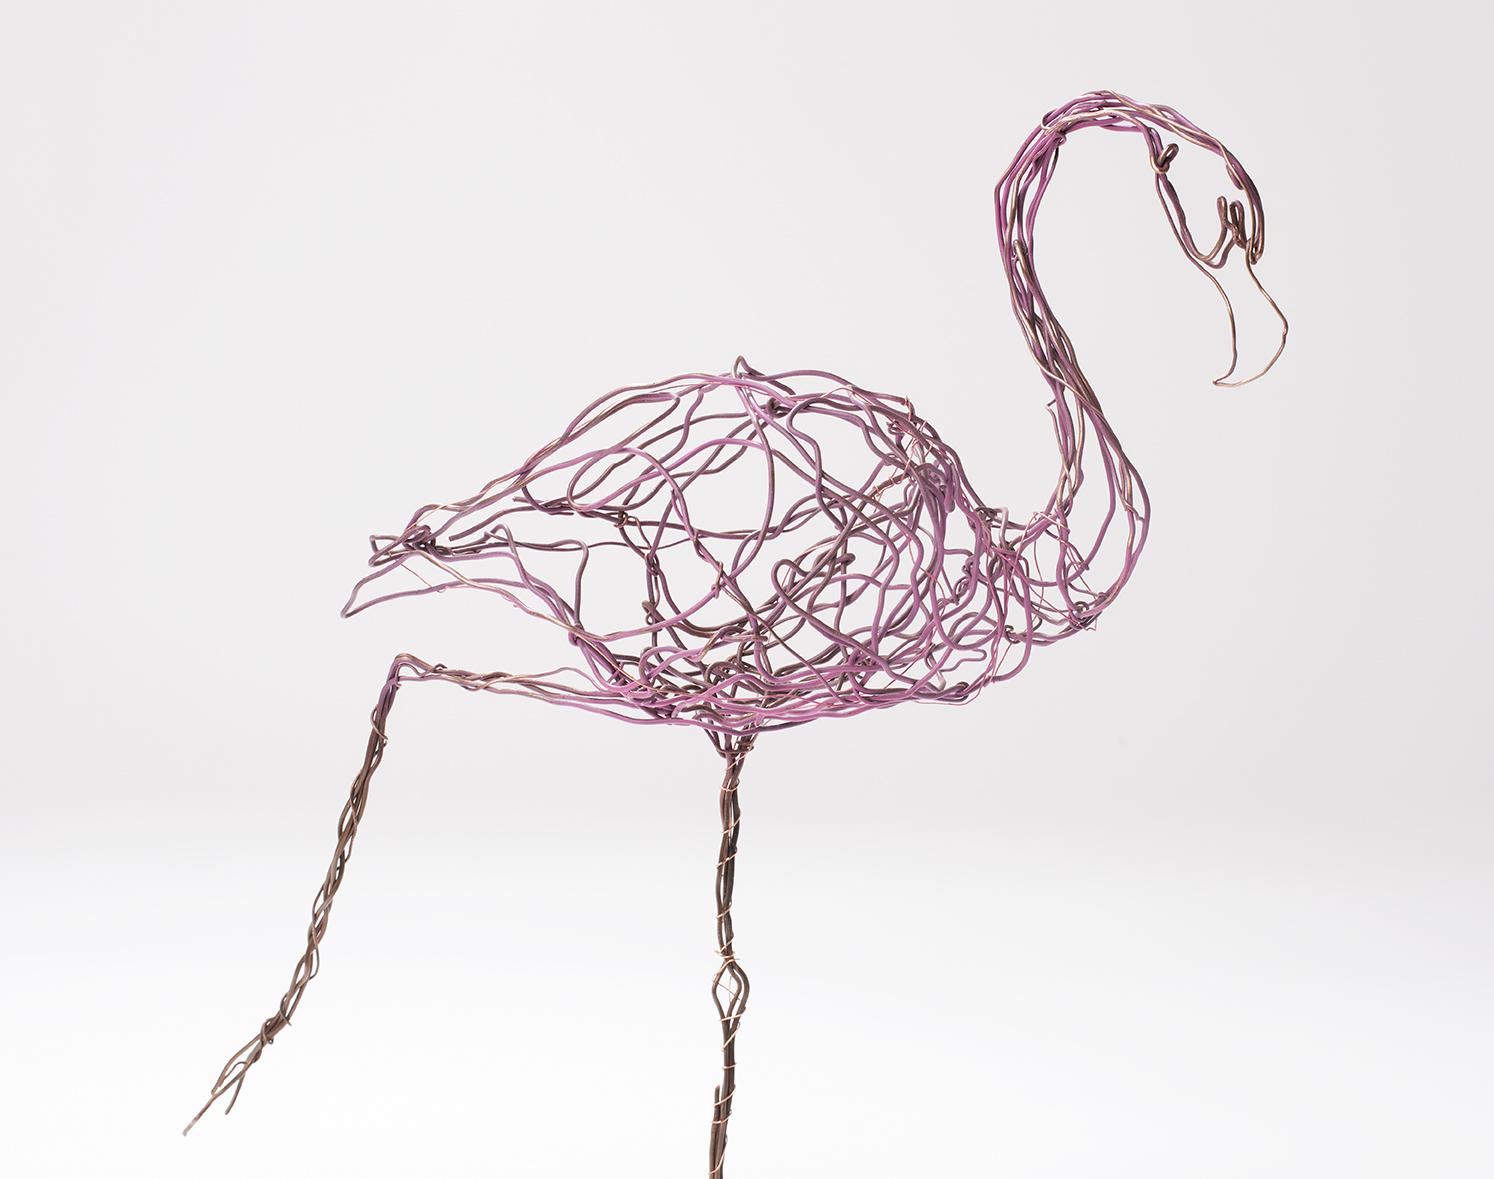 flamingo 002.jpg